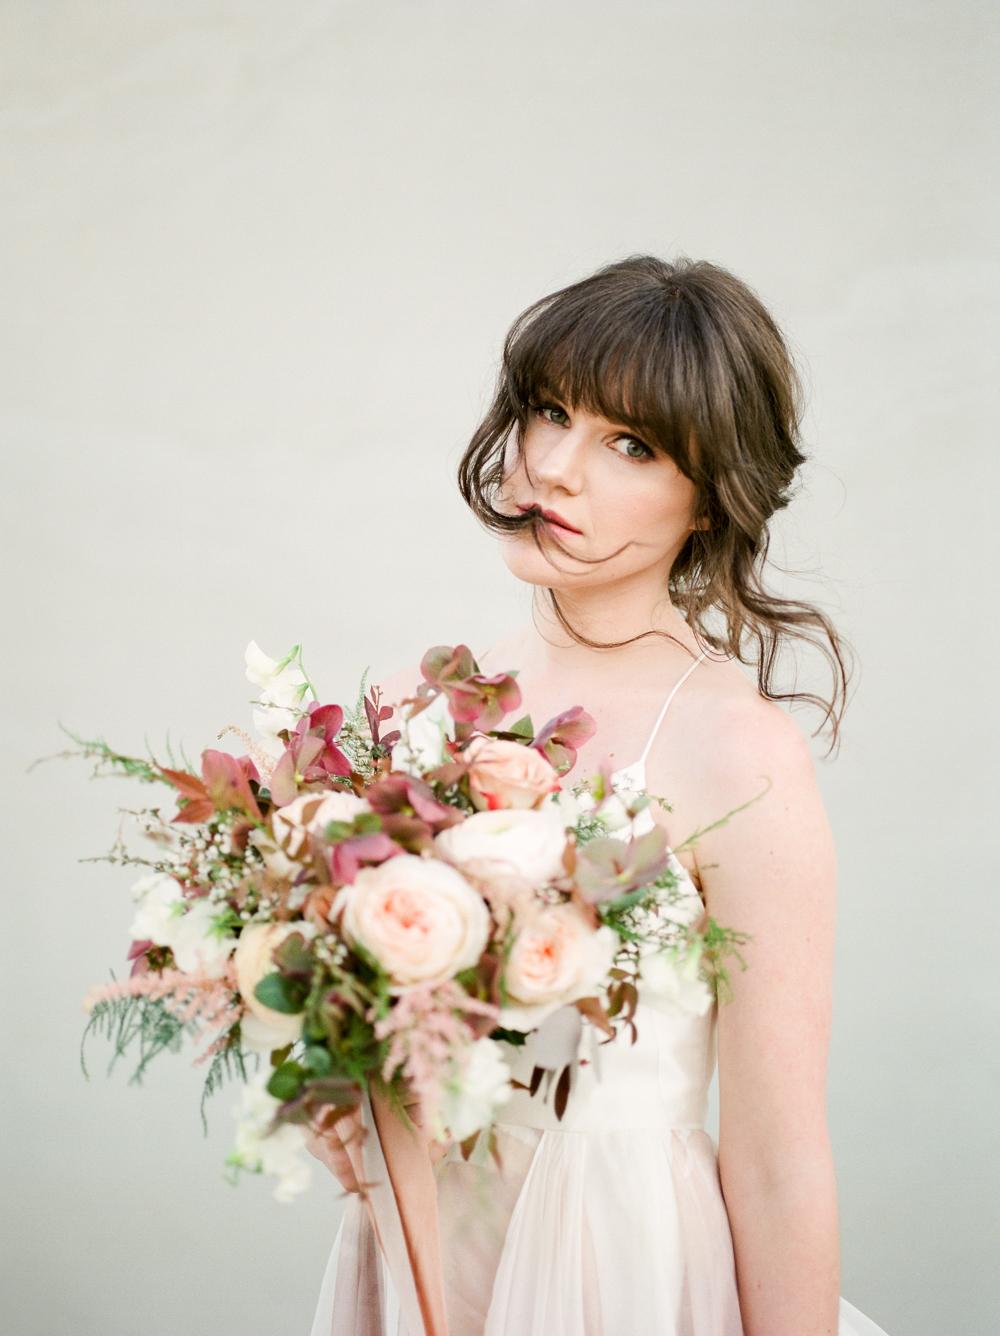 A lovely houston bride_wedding_Christine Gosch_www.christinegosch.com_Houston, TX-15.jpg